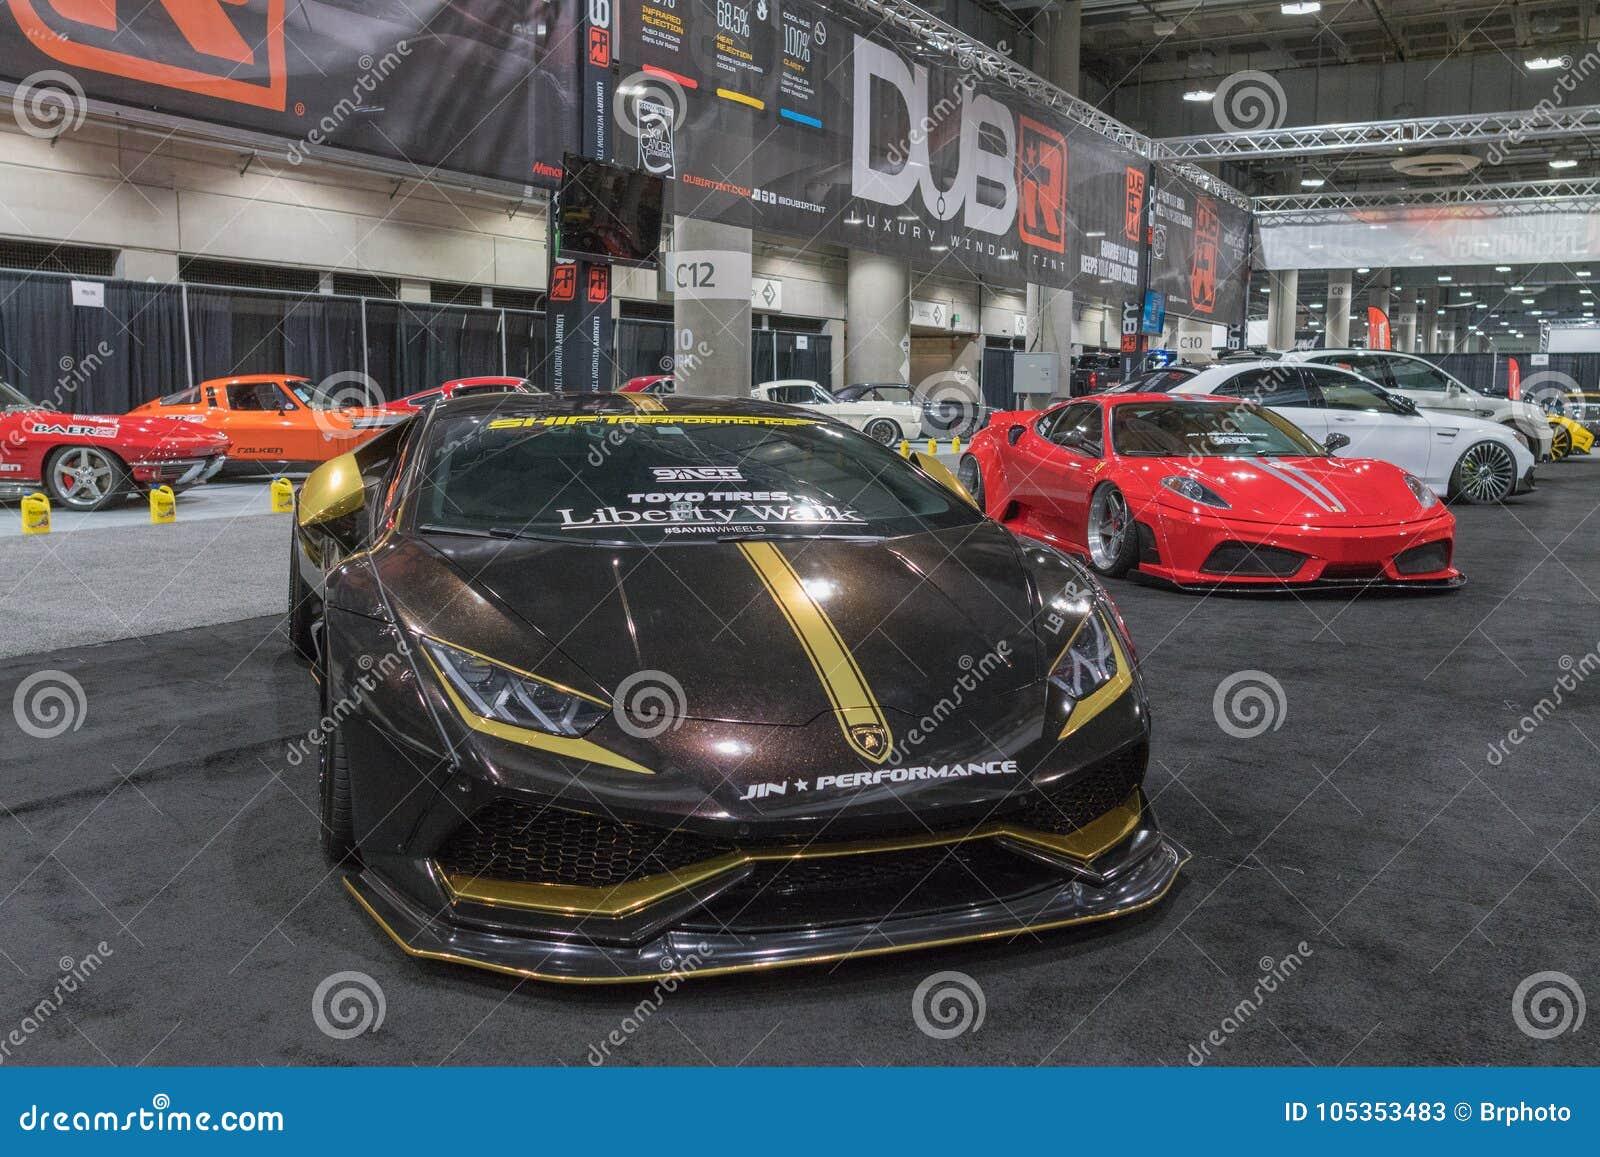 Lamborghini Aventador on display during LA Auto Show